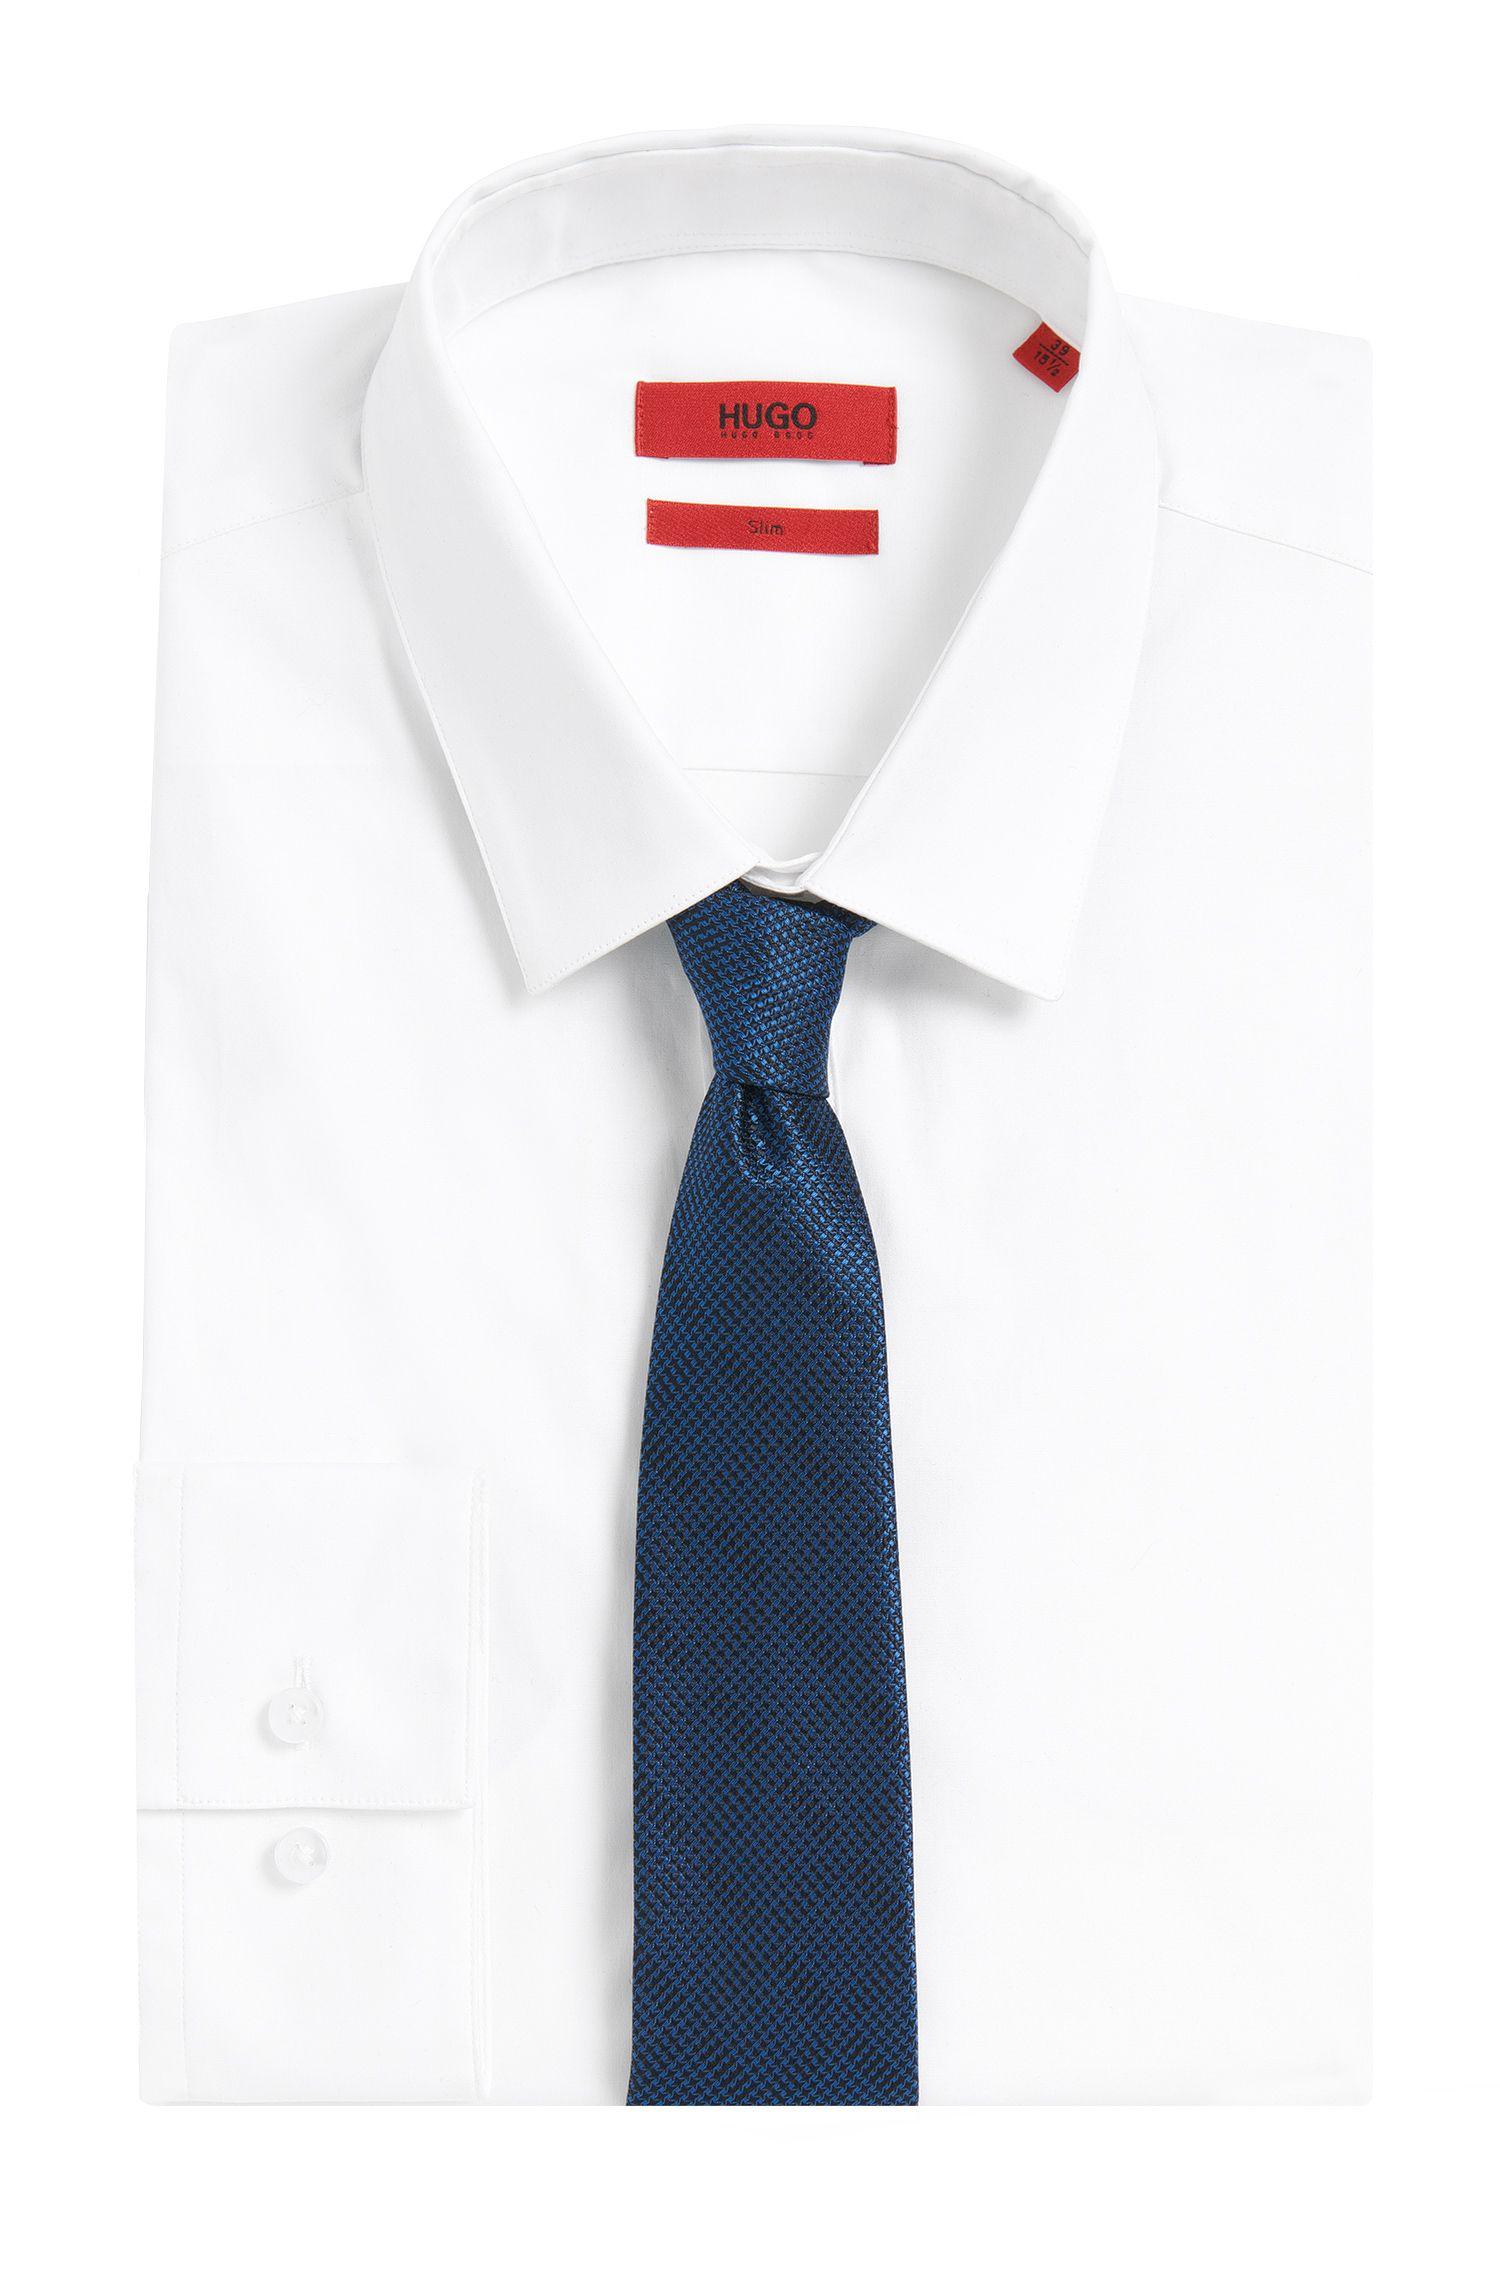 Krawatte aus Seide mit angedeutetem Karo-Muster: 'Tie cm 6'